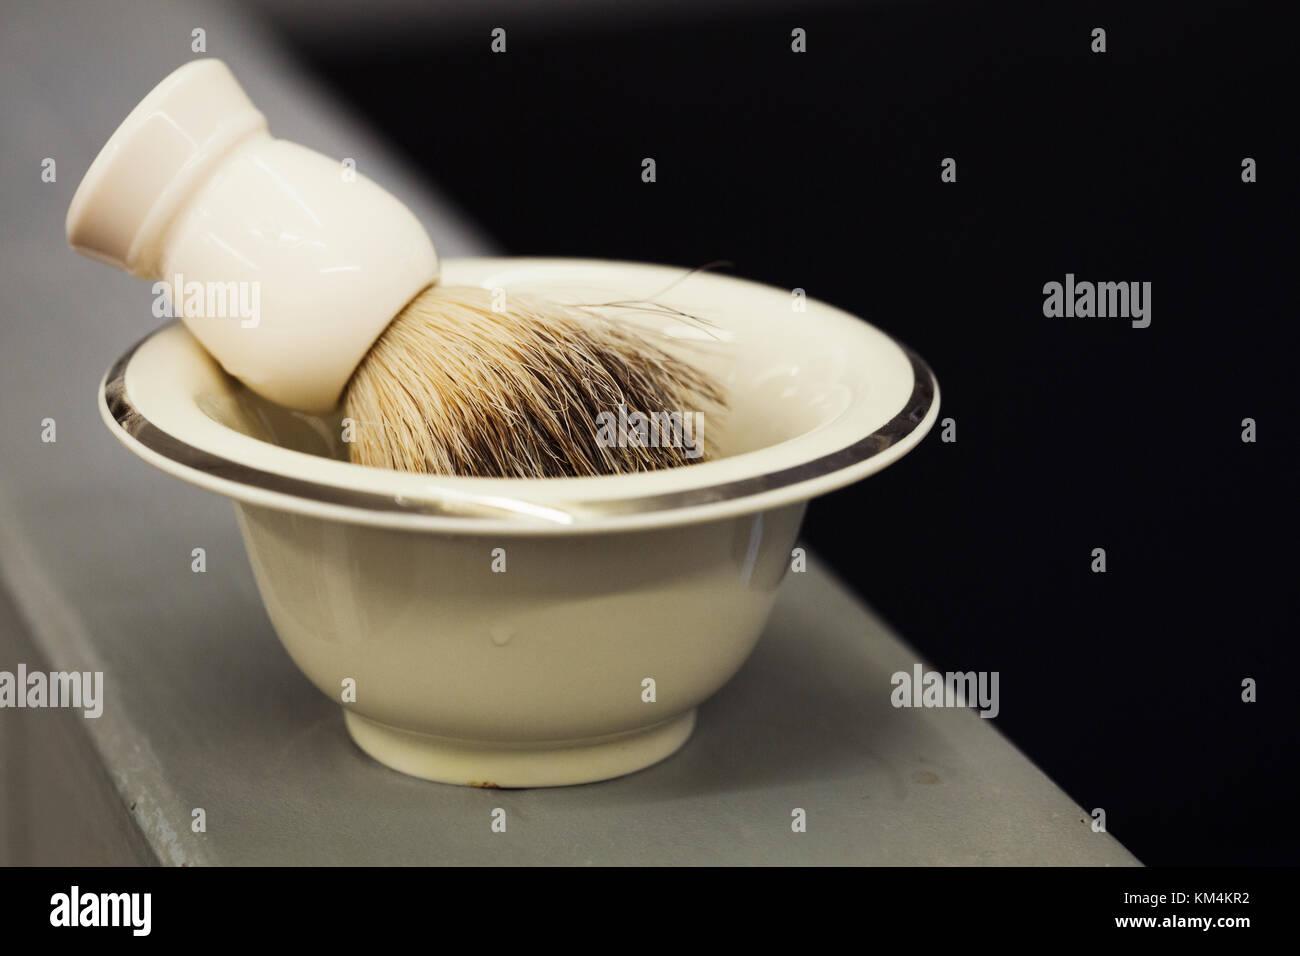 A traditional ceramic shaving bowl and shaving brush. - Stock Image